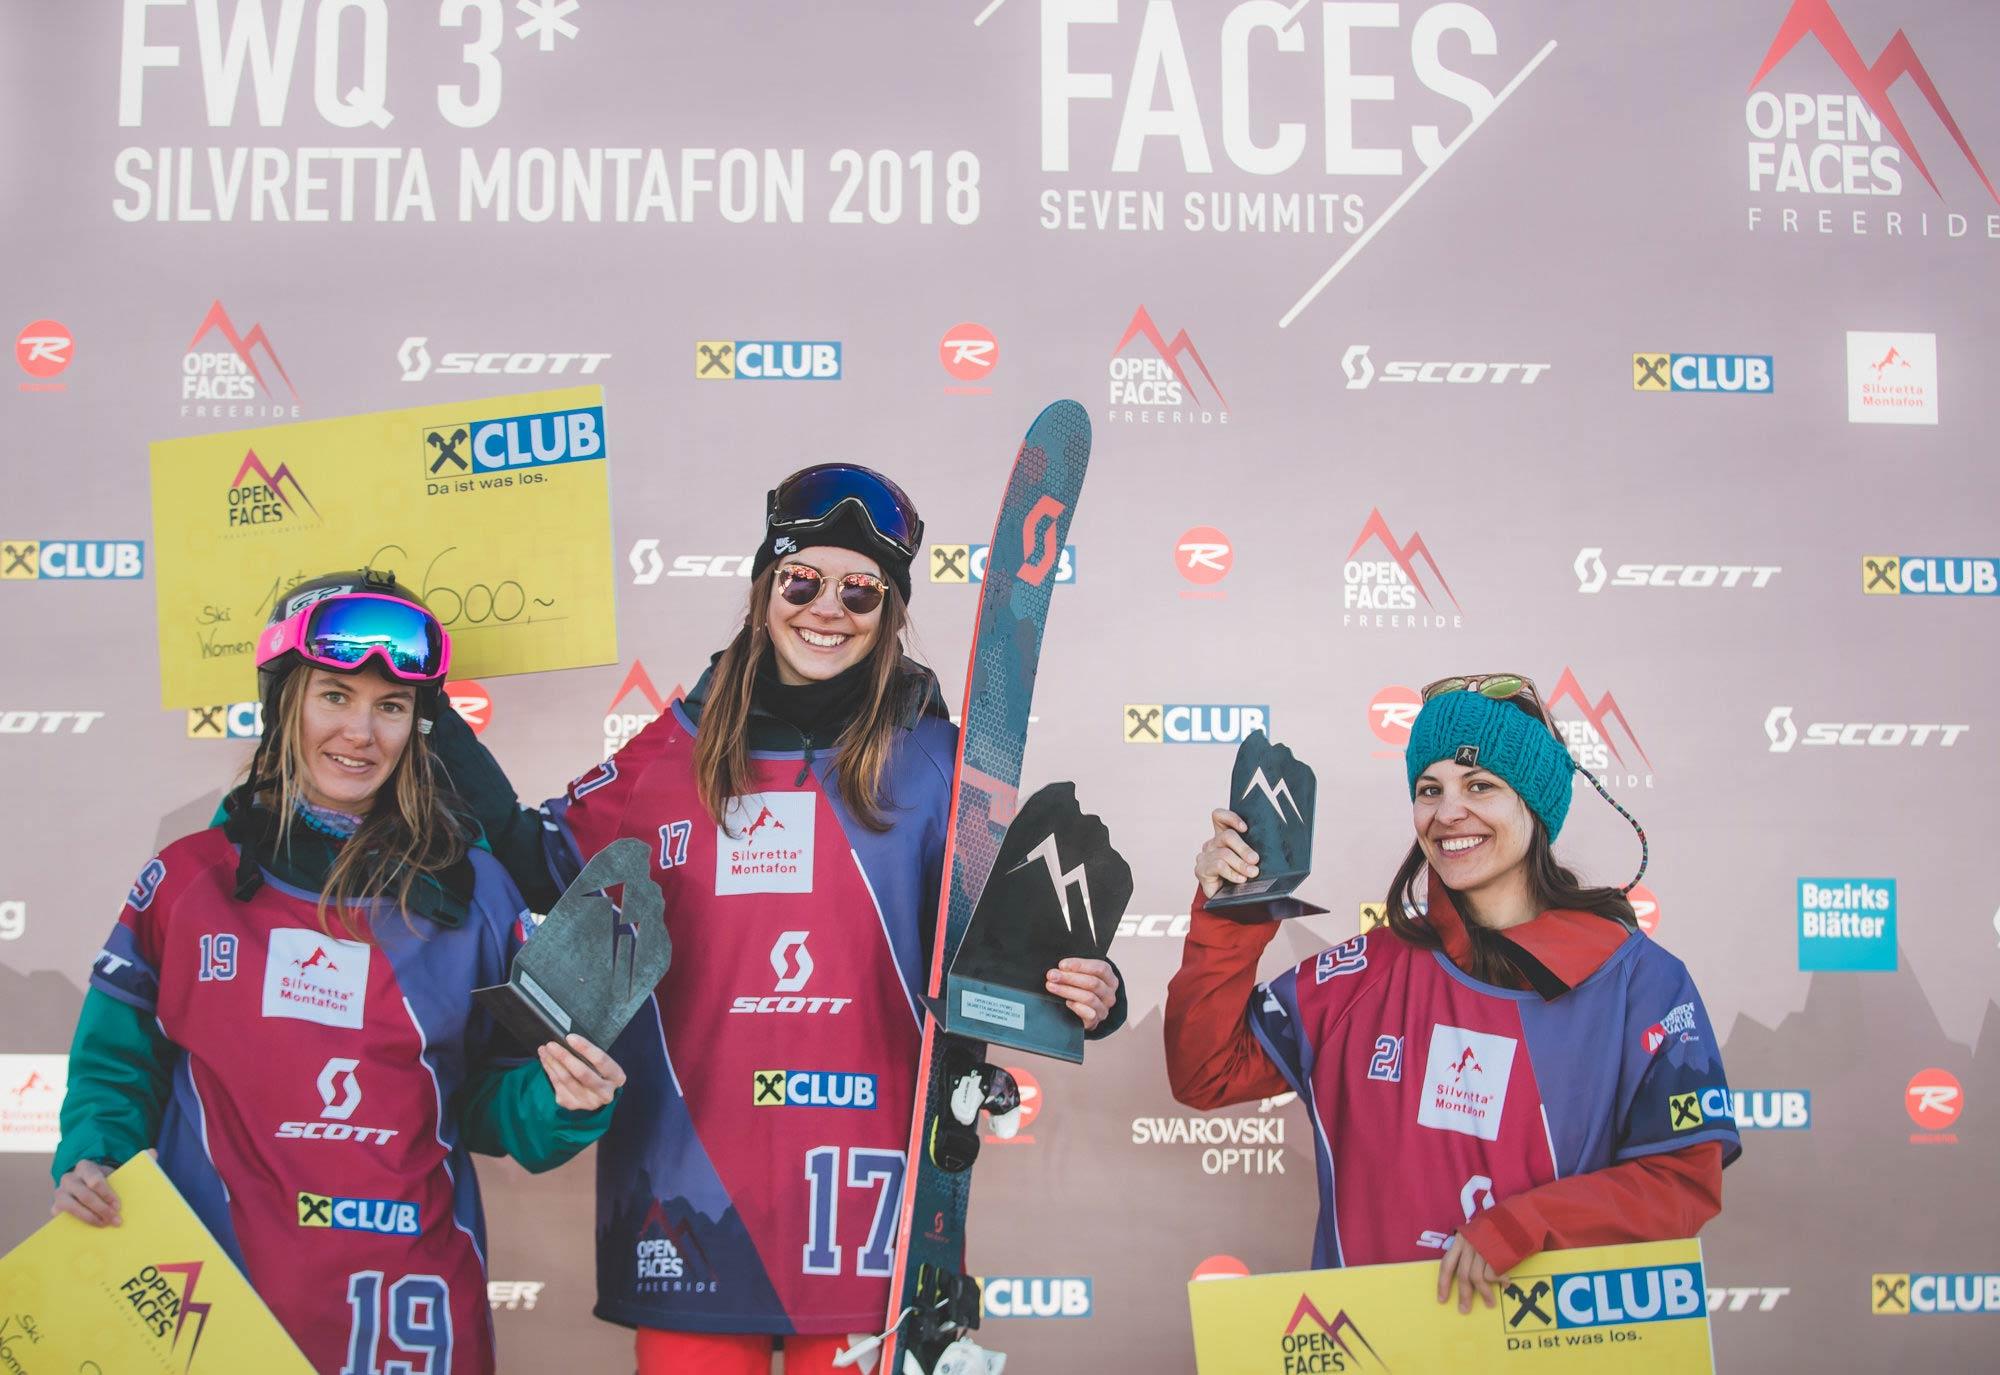 Die drei besten Frauen beim Open Faces Freeride Contest in Silvretta-Montafon (2018): Elena Mitrengova, Laura Überbacher und Claudia Klobasa - Foto: Open Faces/Mia Knoll